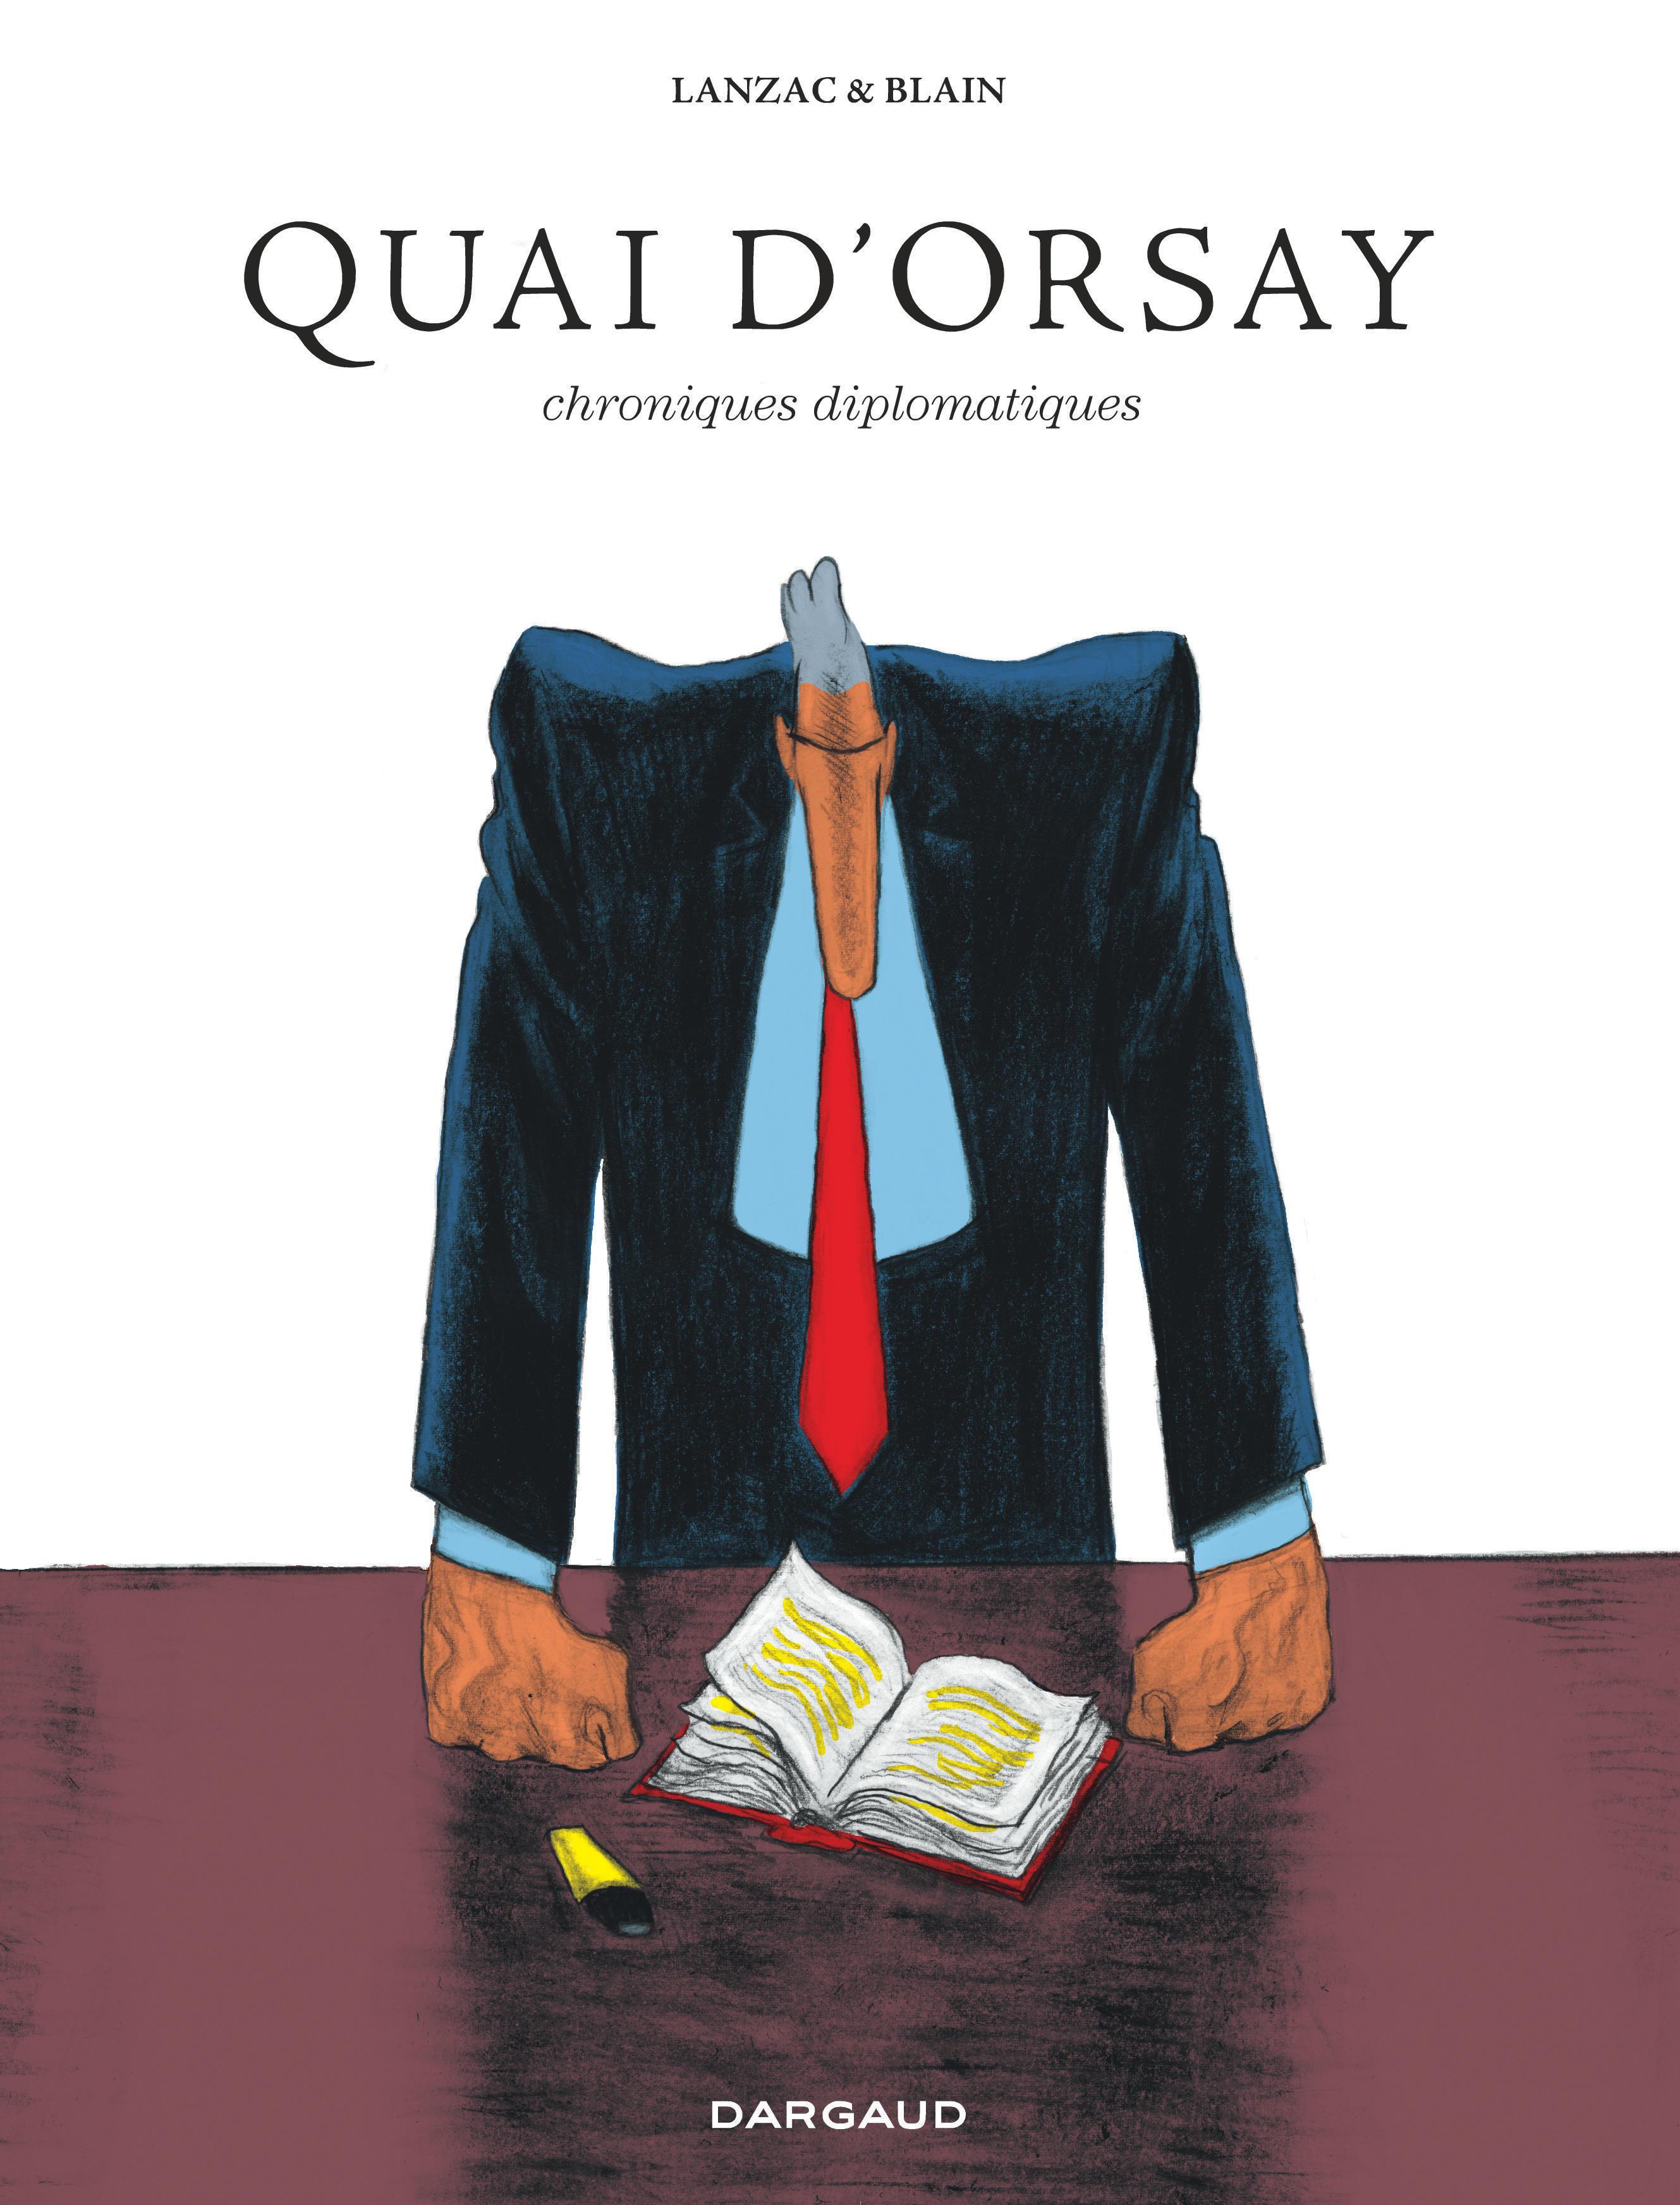 QUAI D'ORSAY INTEGRALE - QUAI D'ORSAY - INTEGRALE - TOME 0 - QUAI D'ORSAY  INTEGRALE